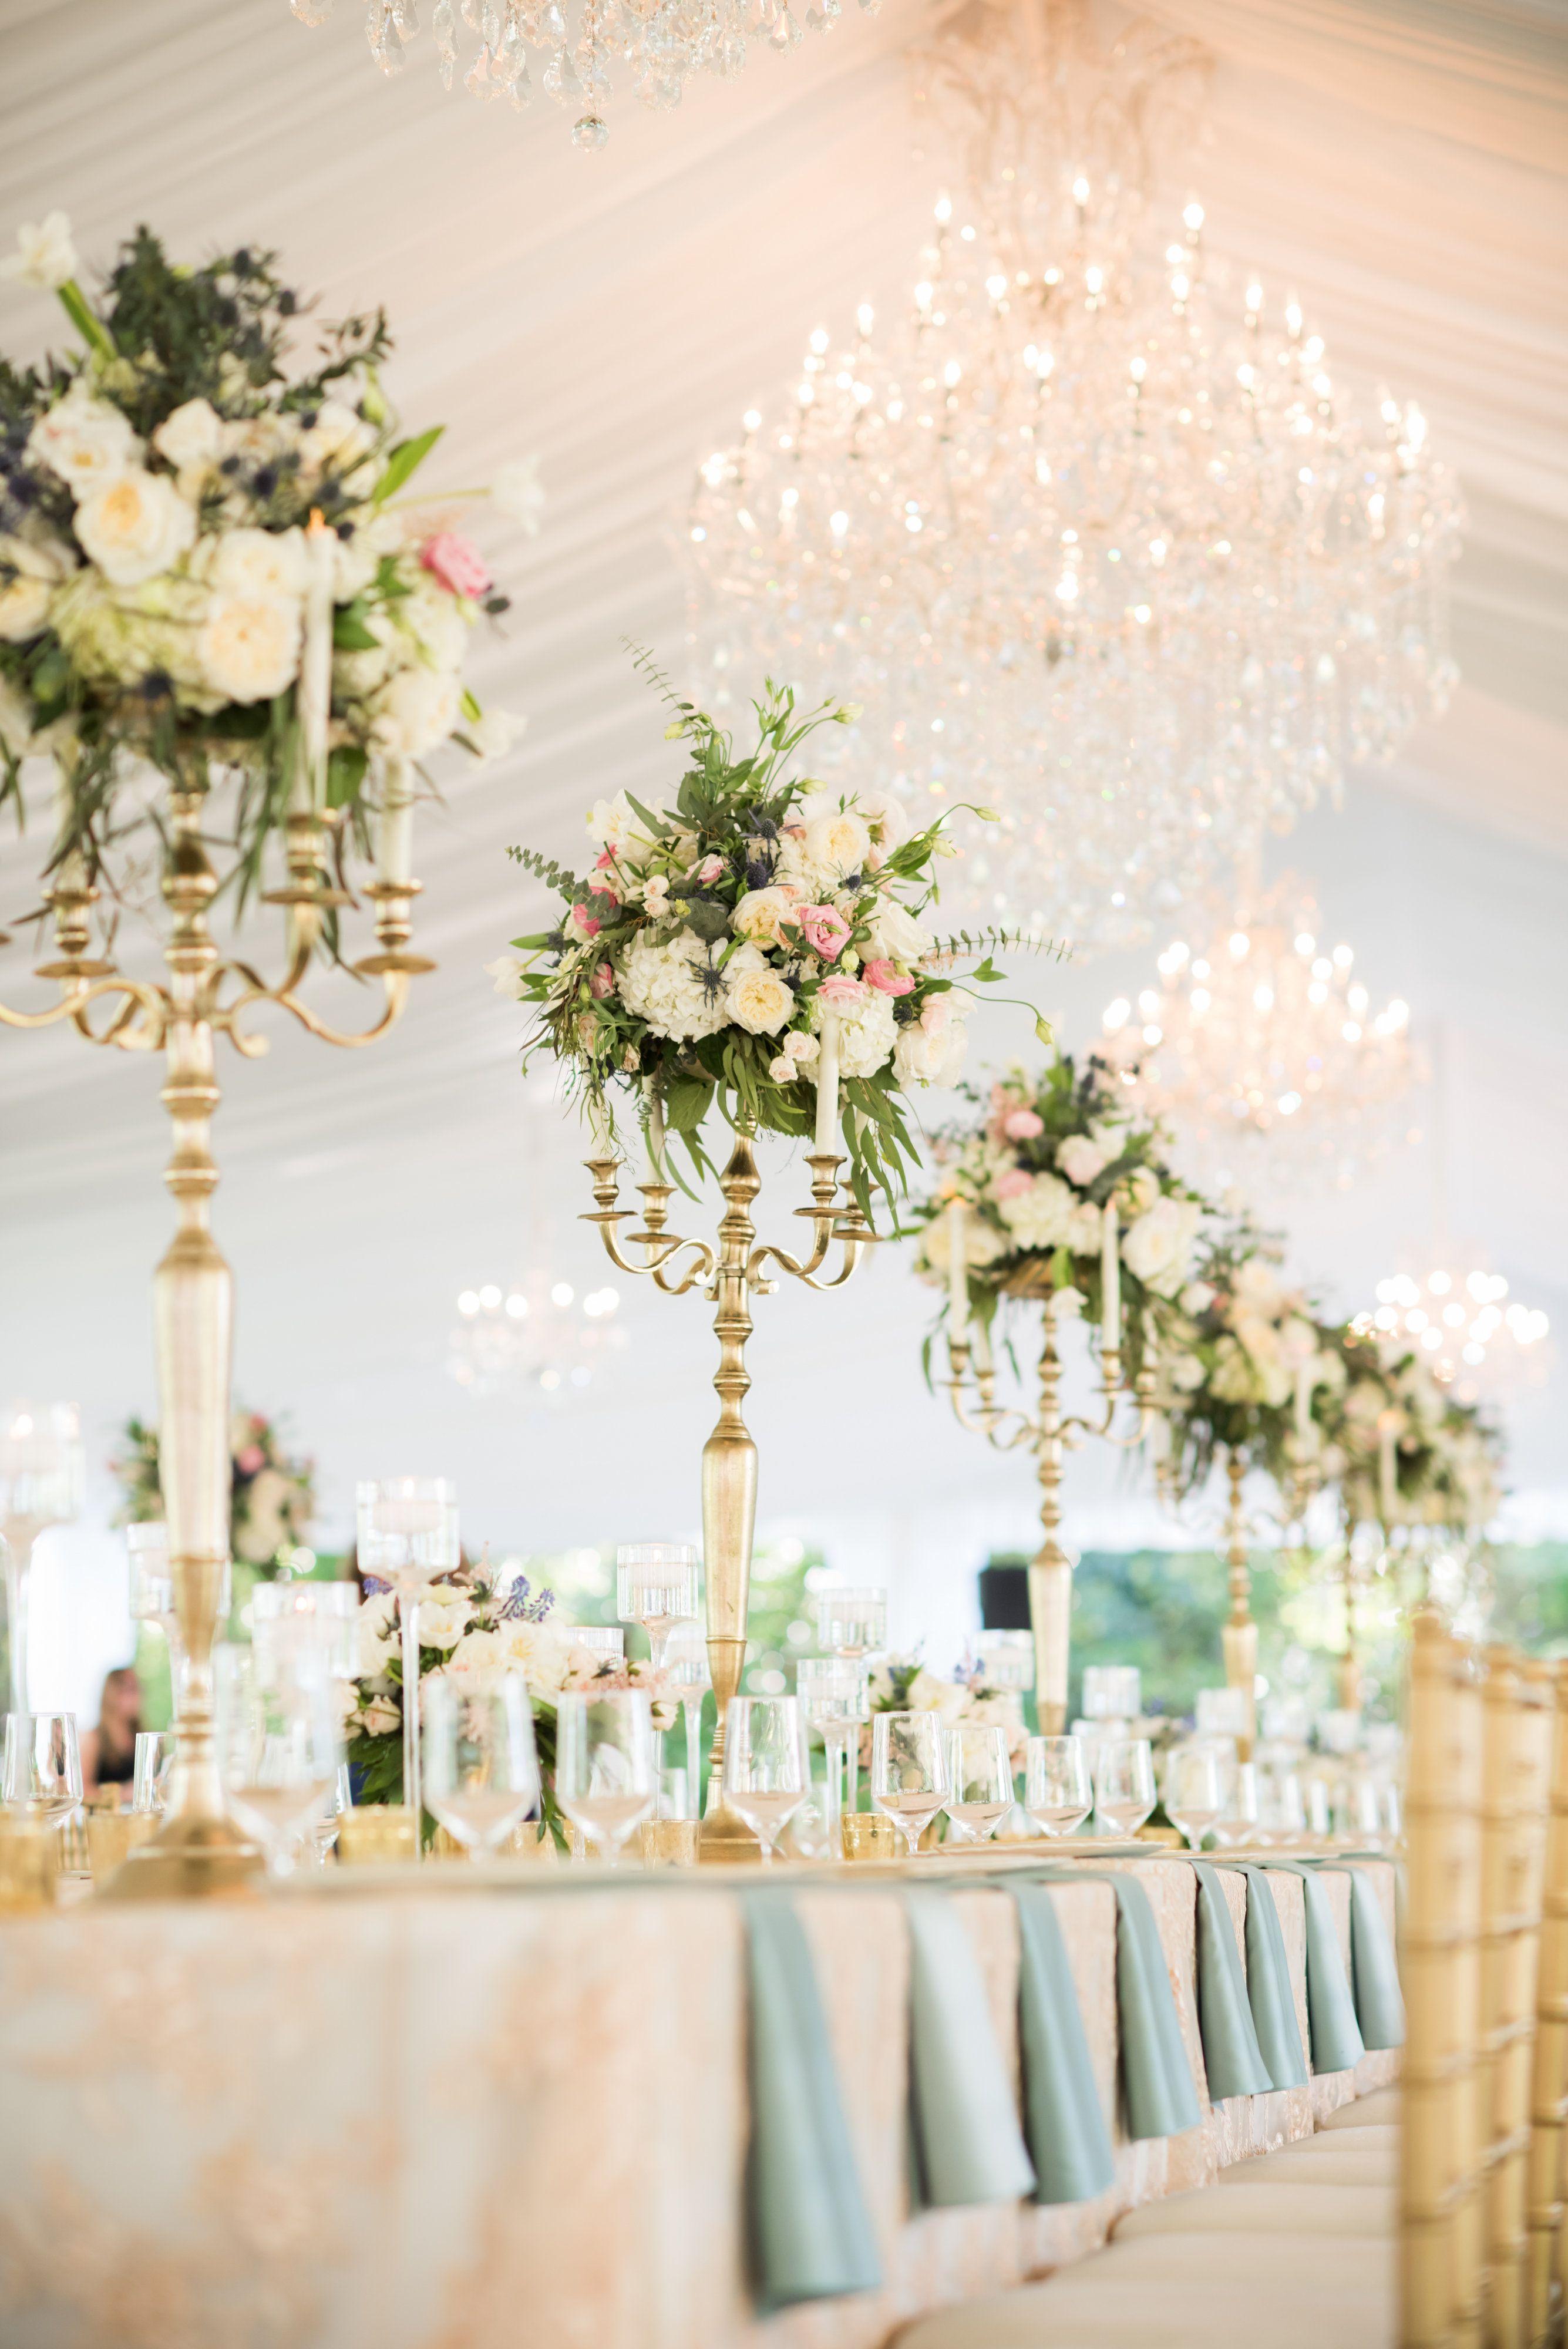 Elegant Alfresco Garden Party Wedding with Pastel Color Palette ...